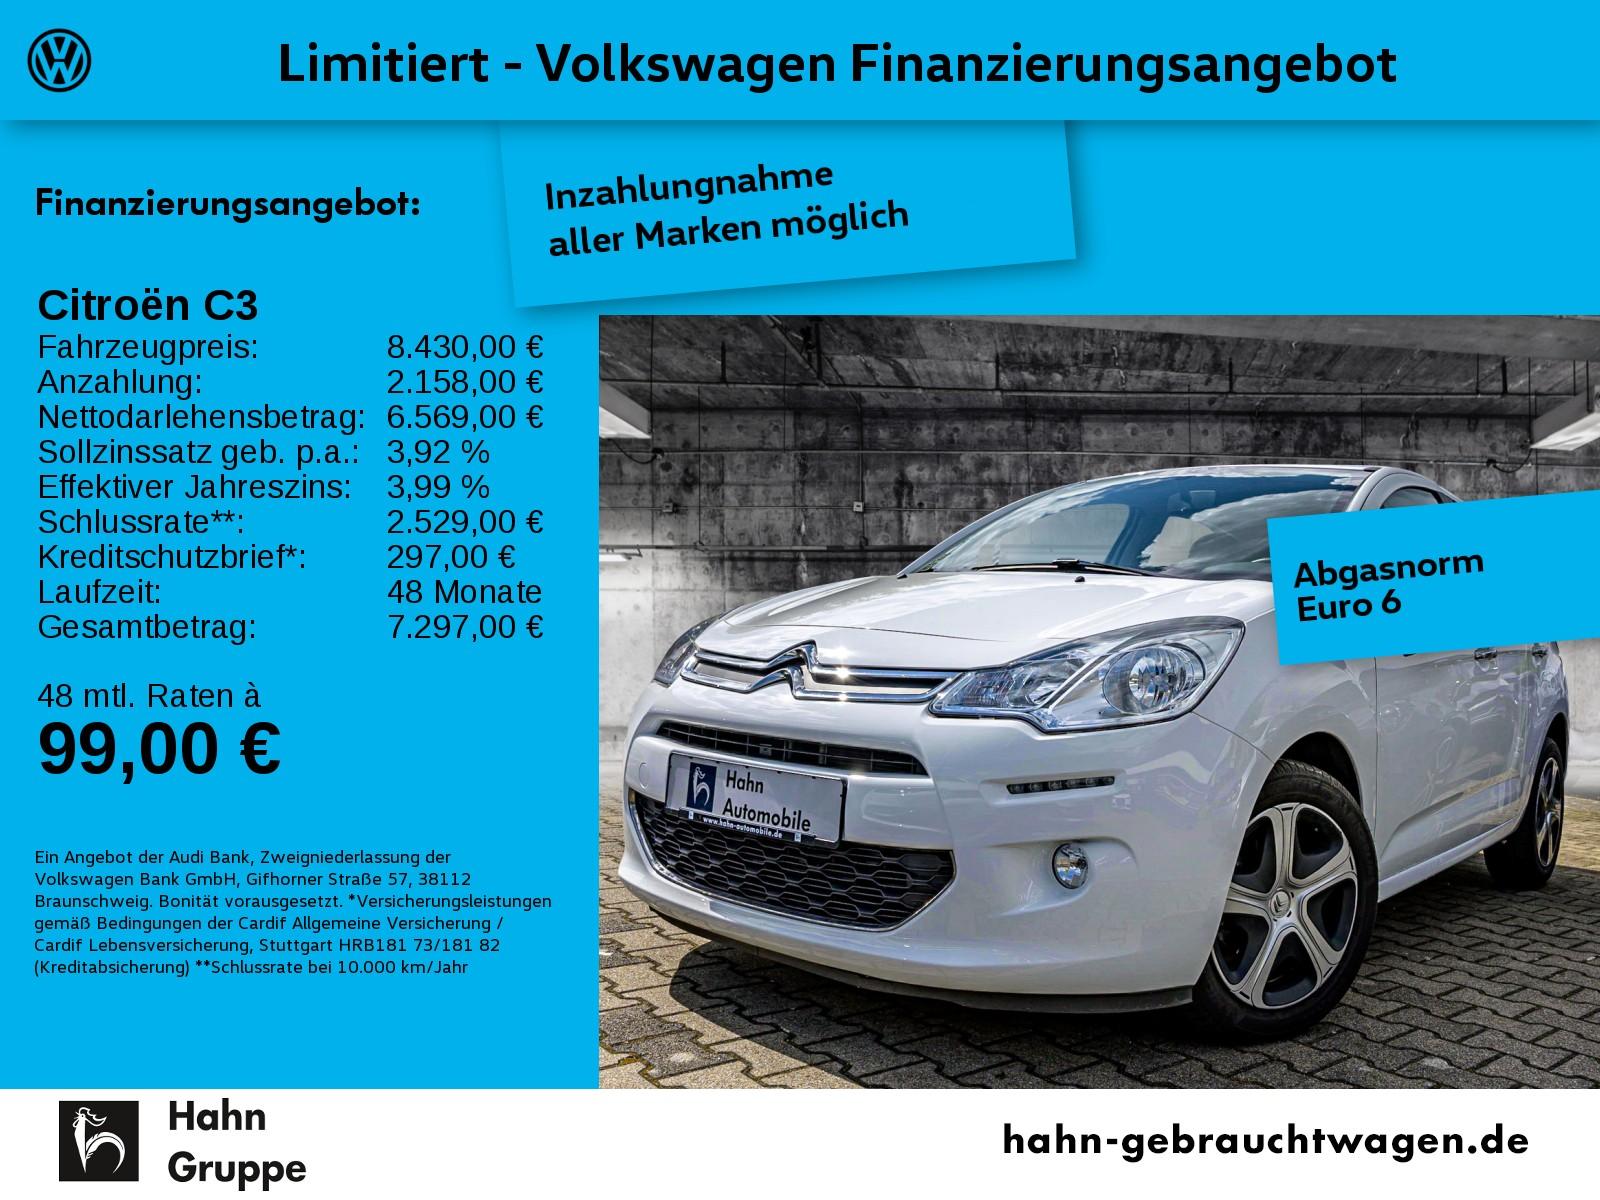 Citroën C3 Citroën Selection 1.2 Klima ZV Tempo Start/Stopp, Jahr 2016, Benzin